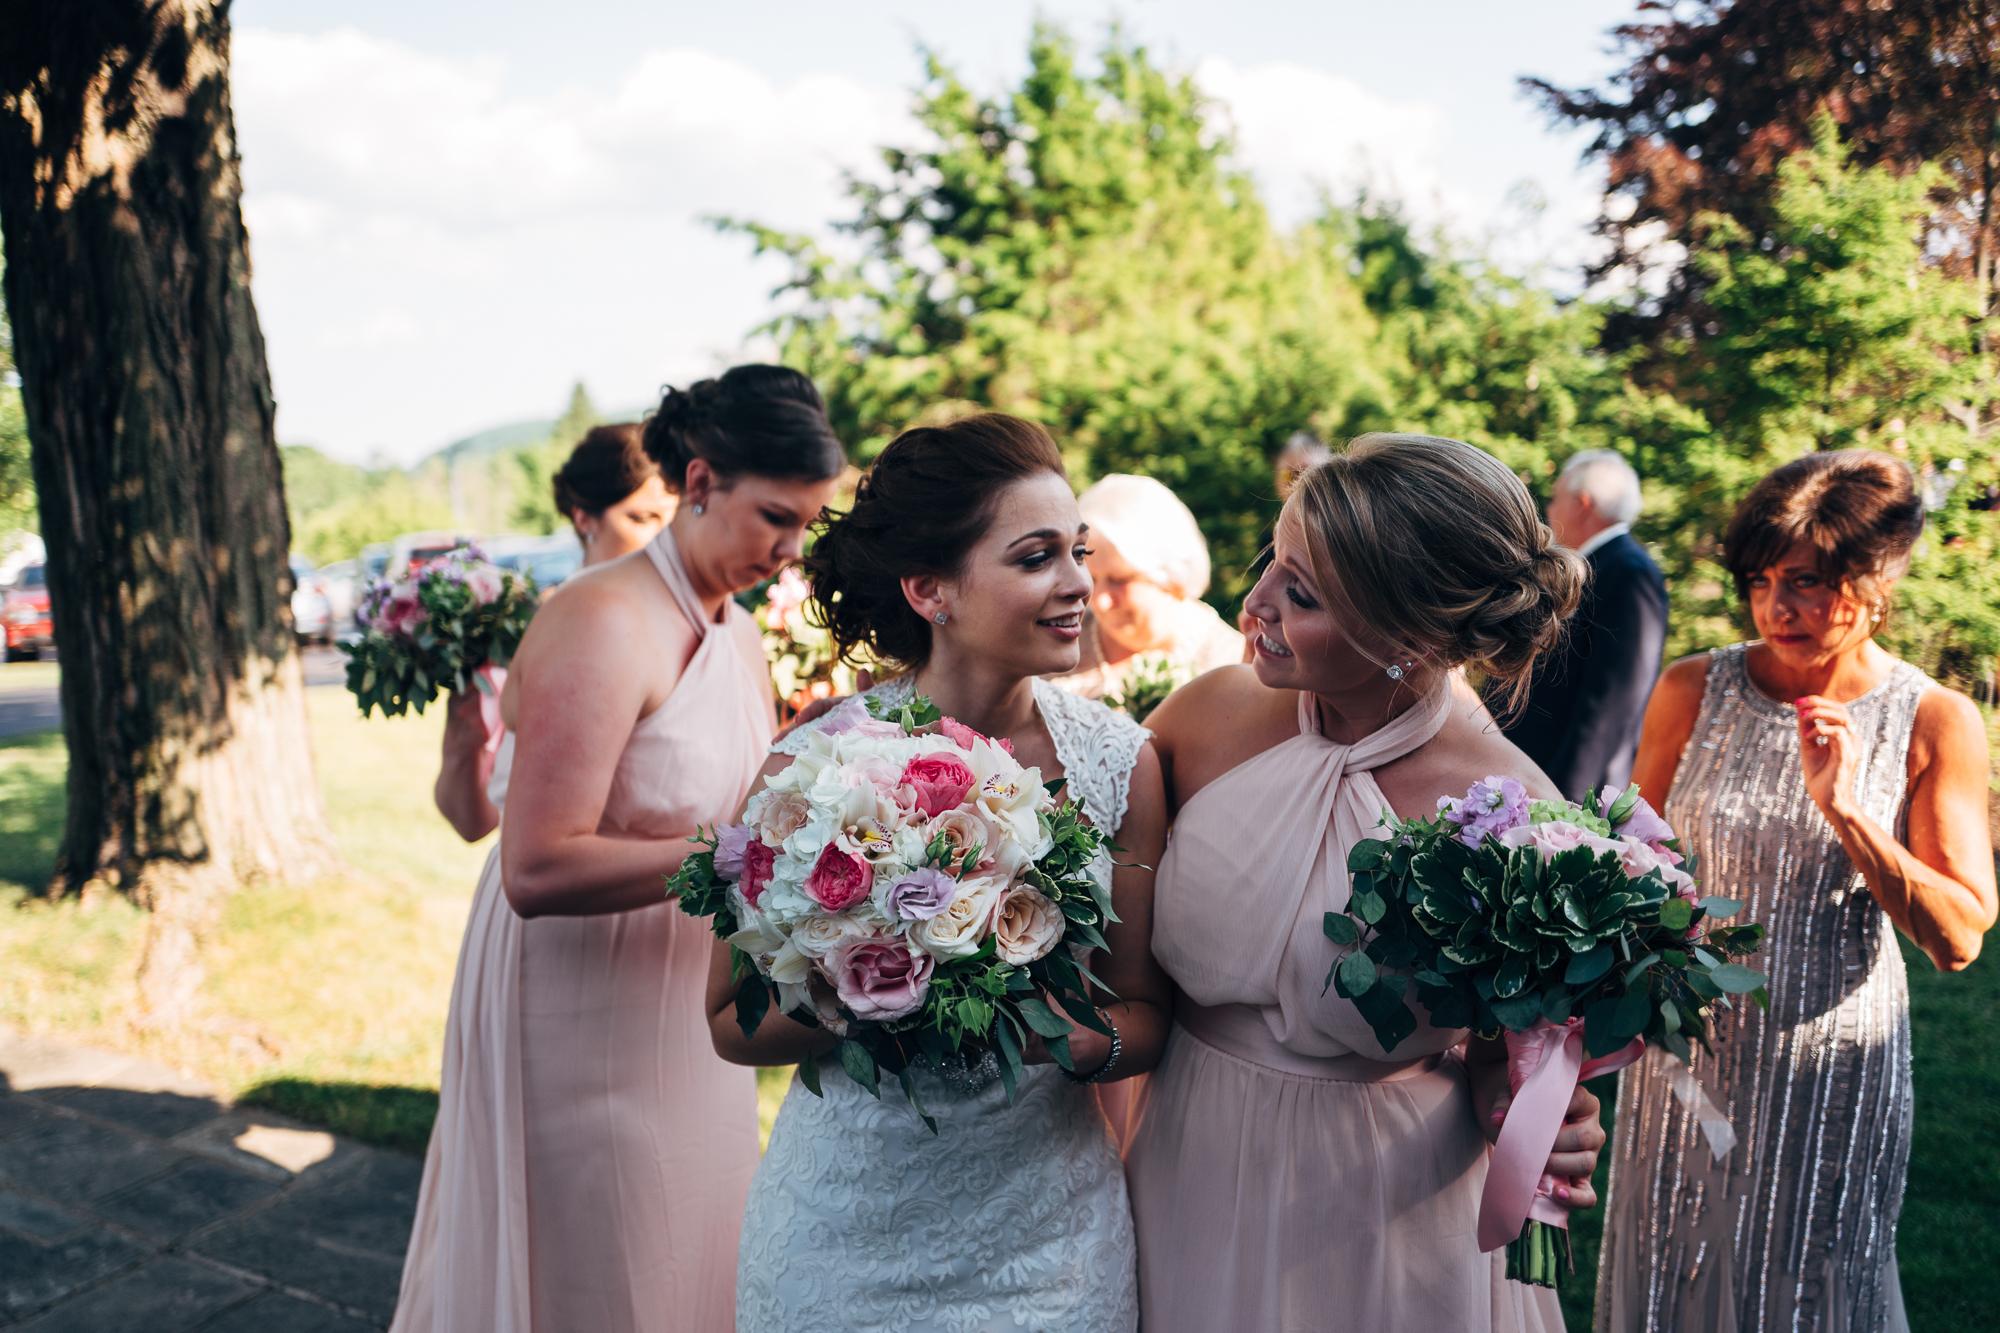 scranton-wedding-photography-zak-zavada-2016.06-rebeccaIan-0537.jpg